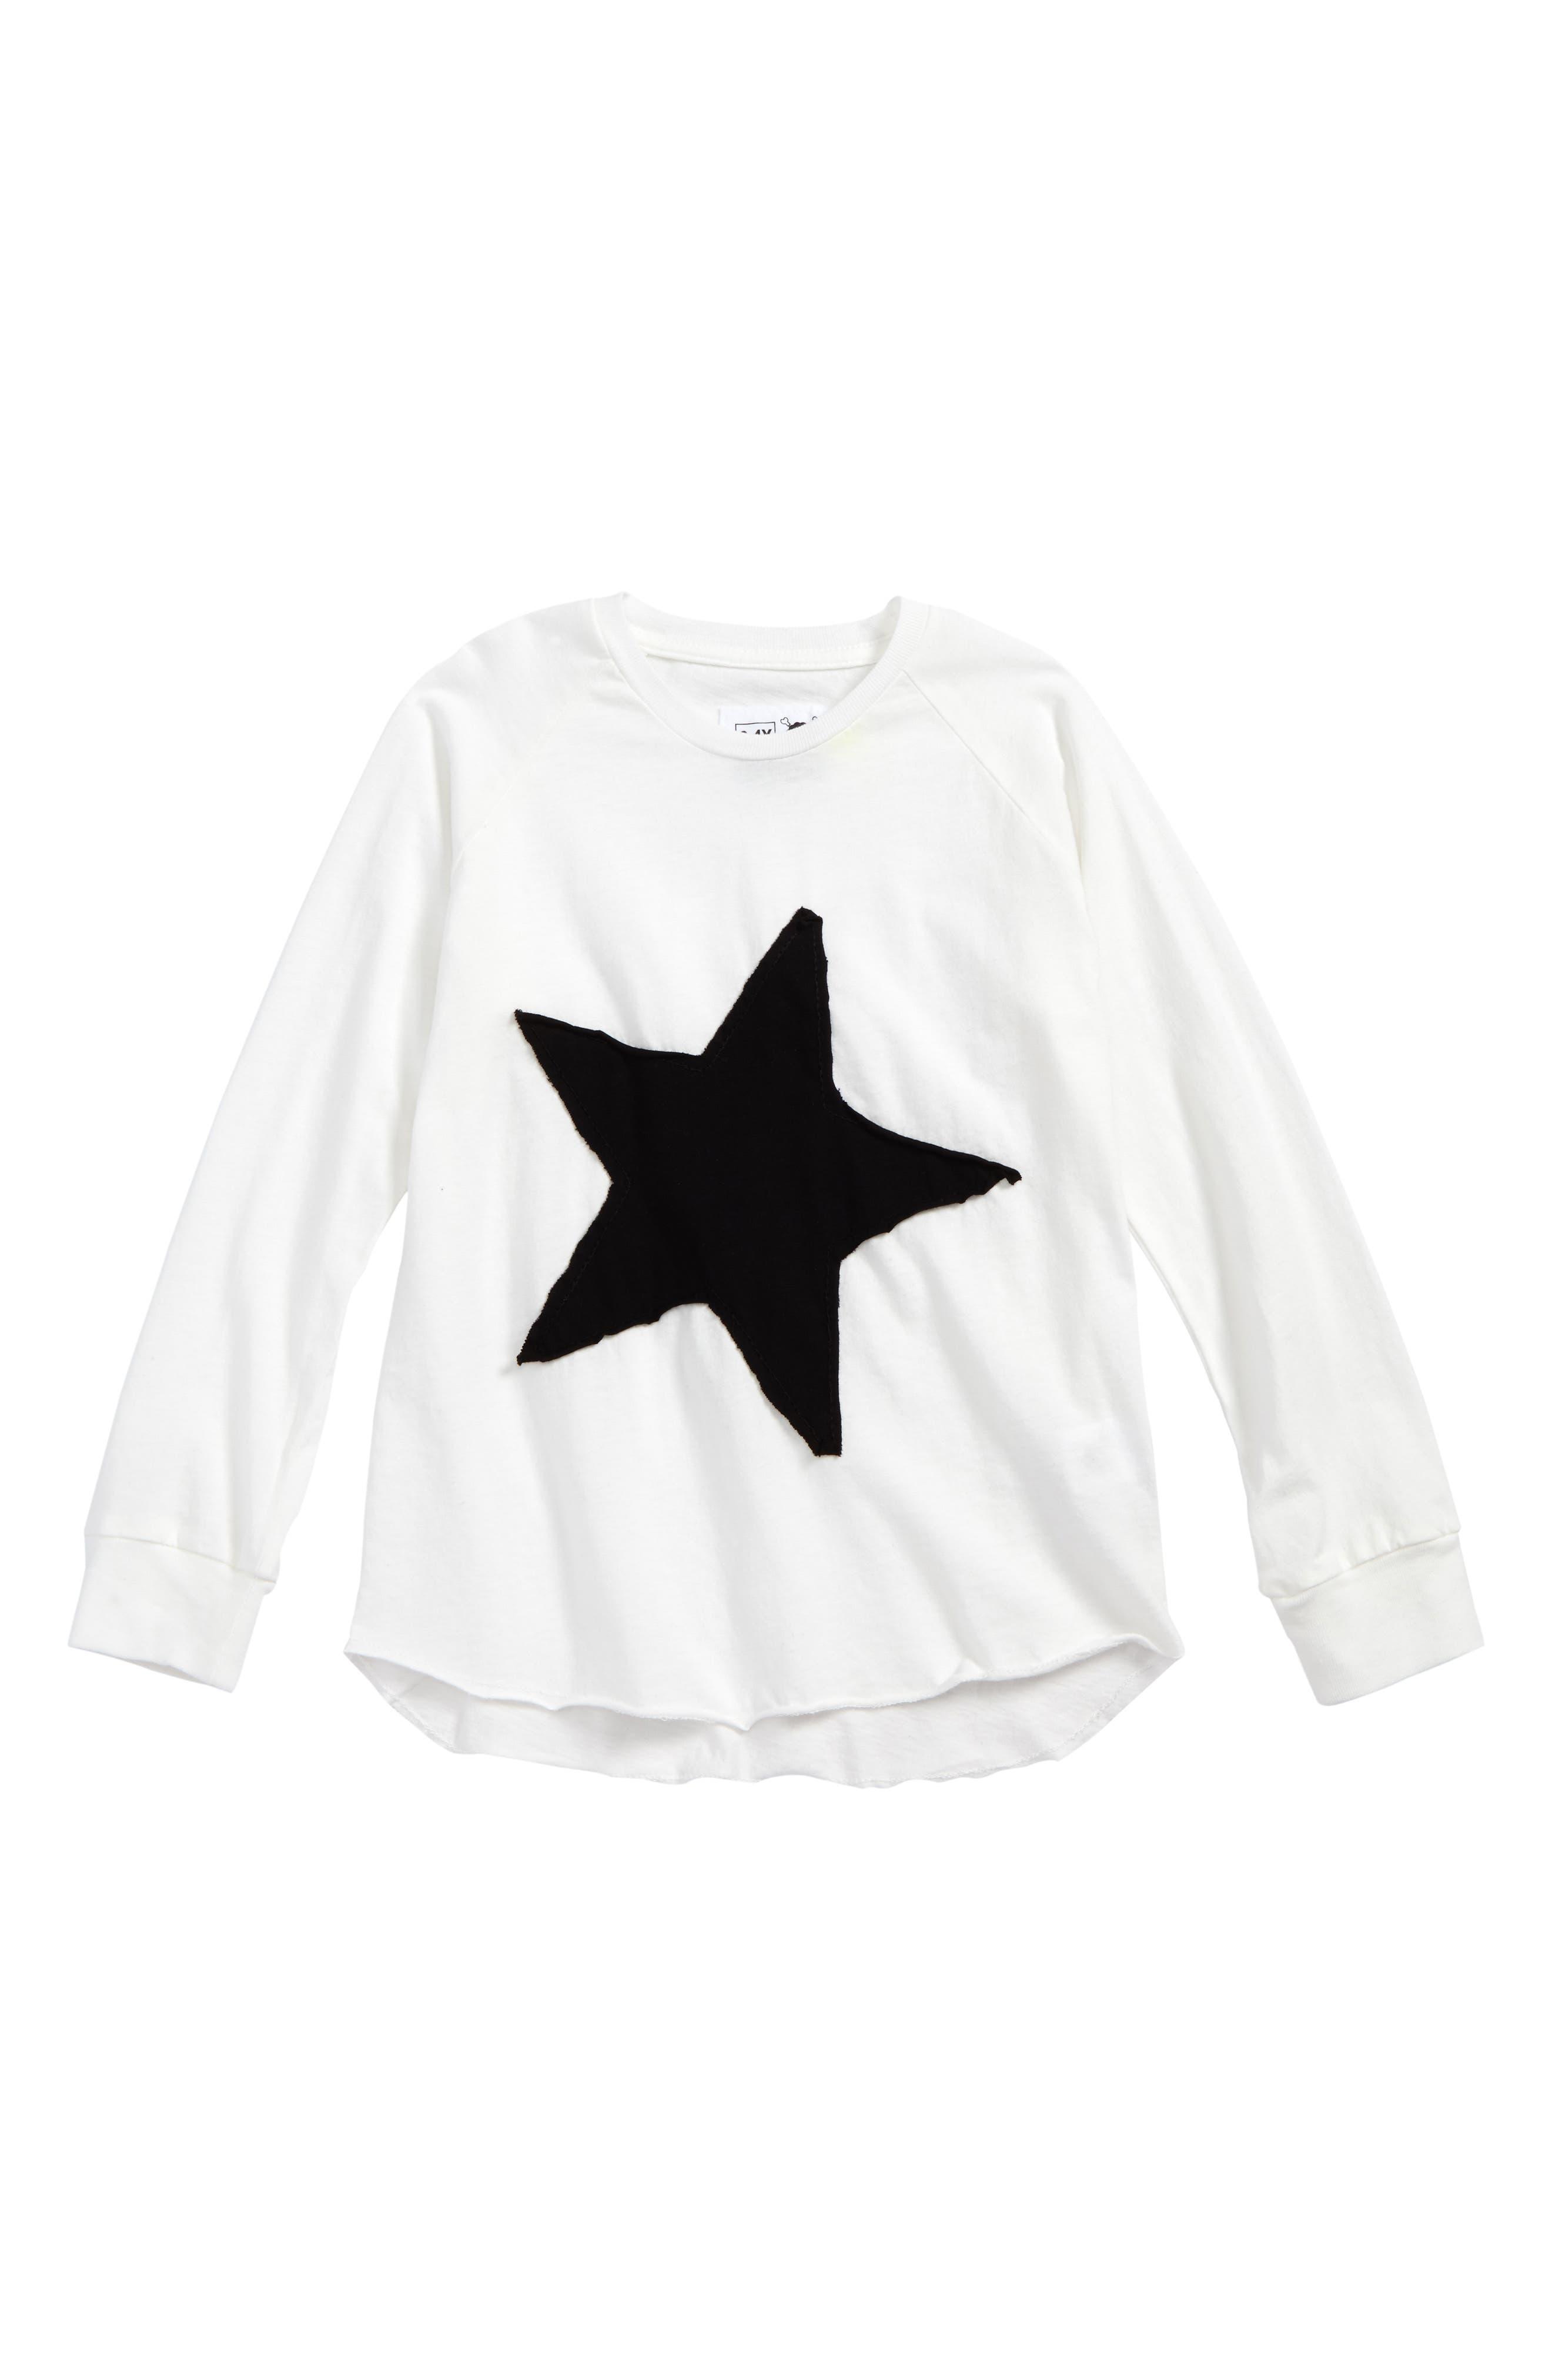 Alternate Image 1 Selected - NUNUNU Star Patch Tee (Toddler Girls & Little Girls)